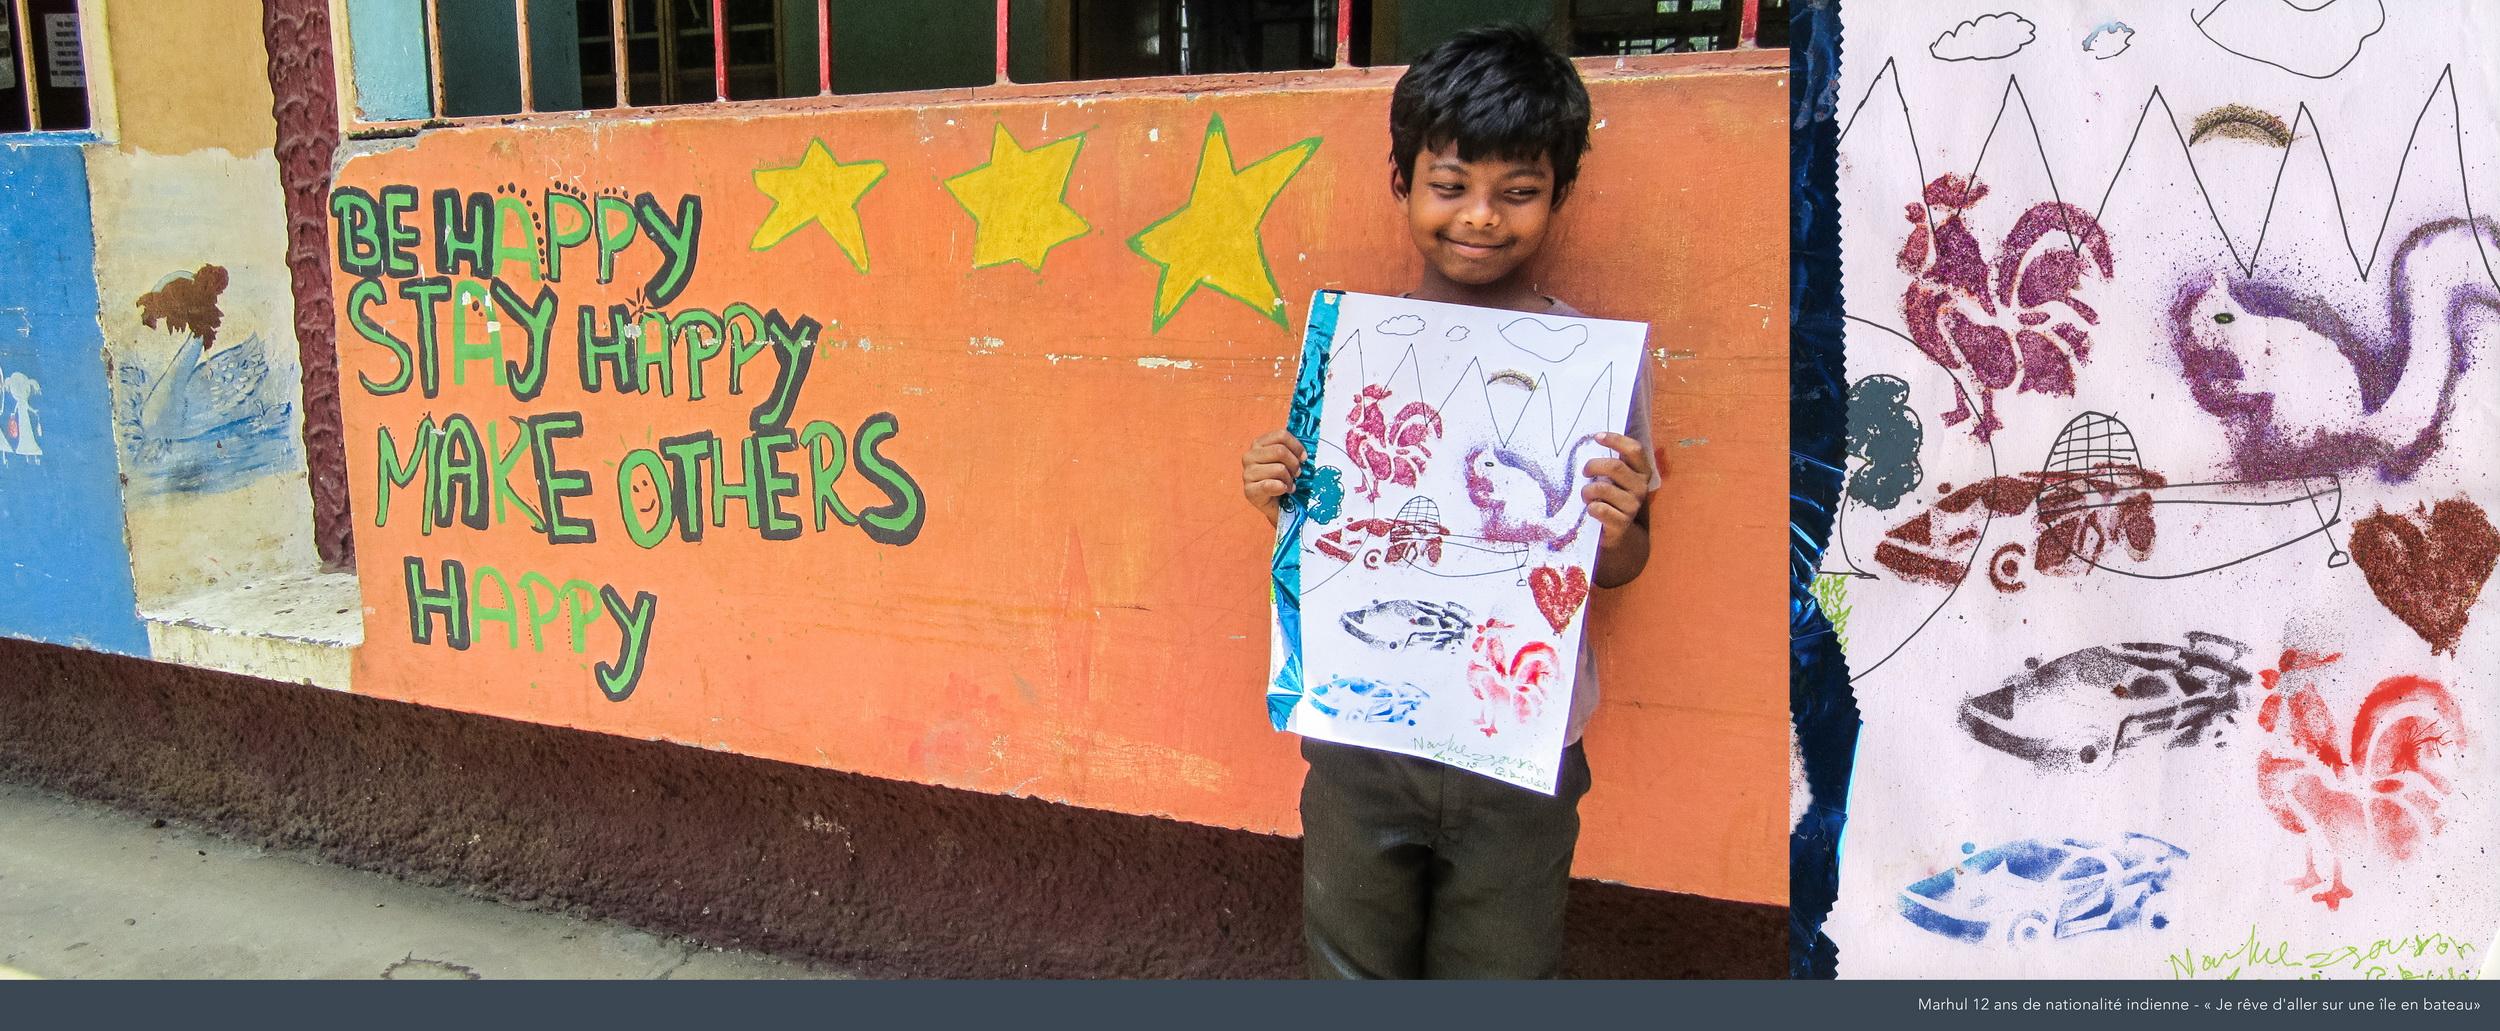 Marhul, 12 ans, Inde.